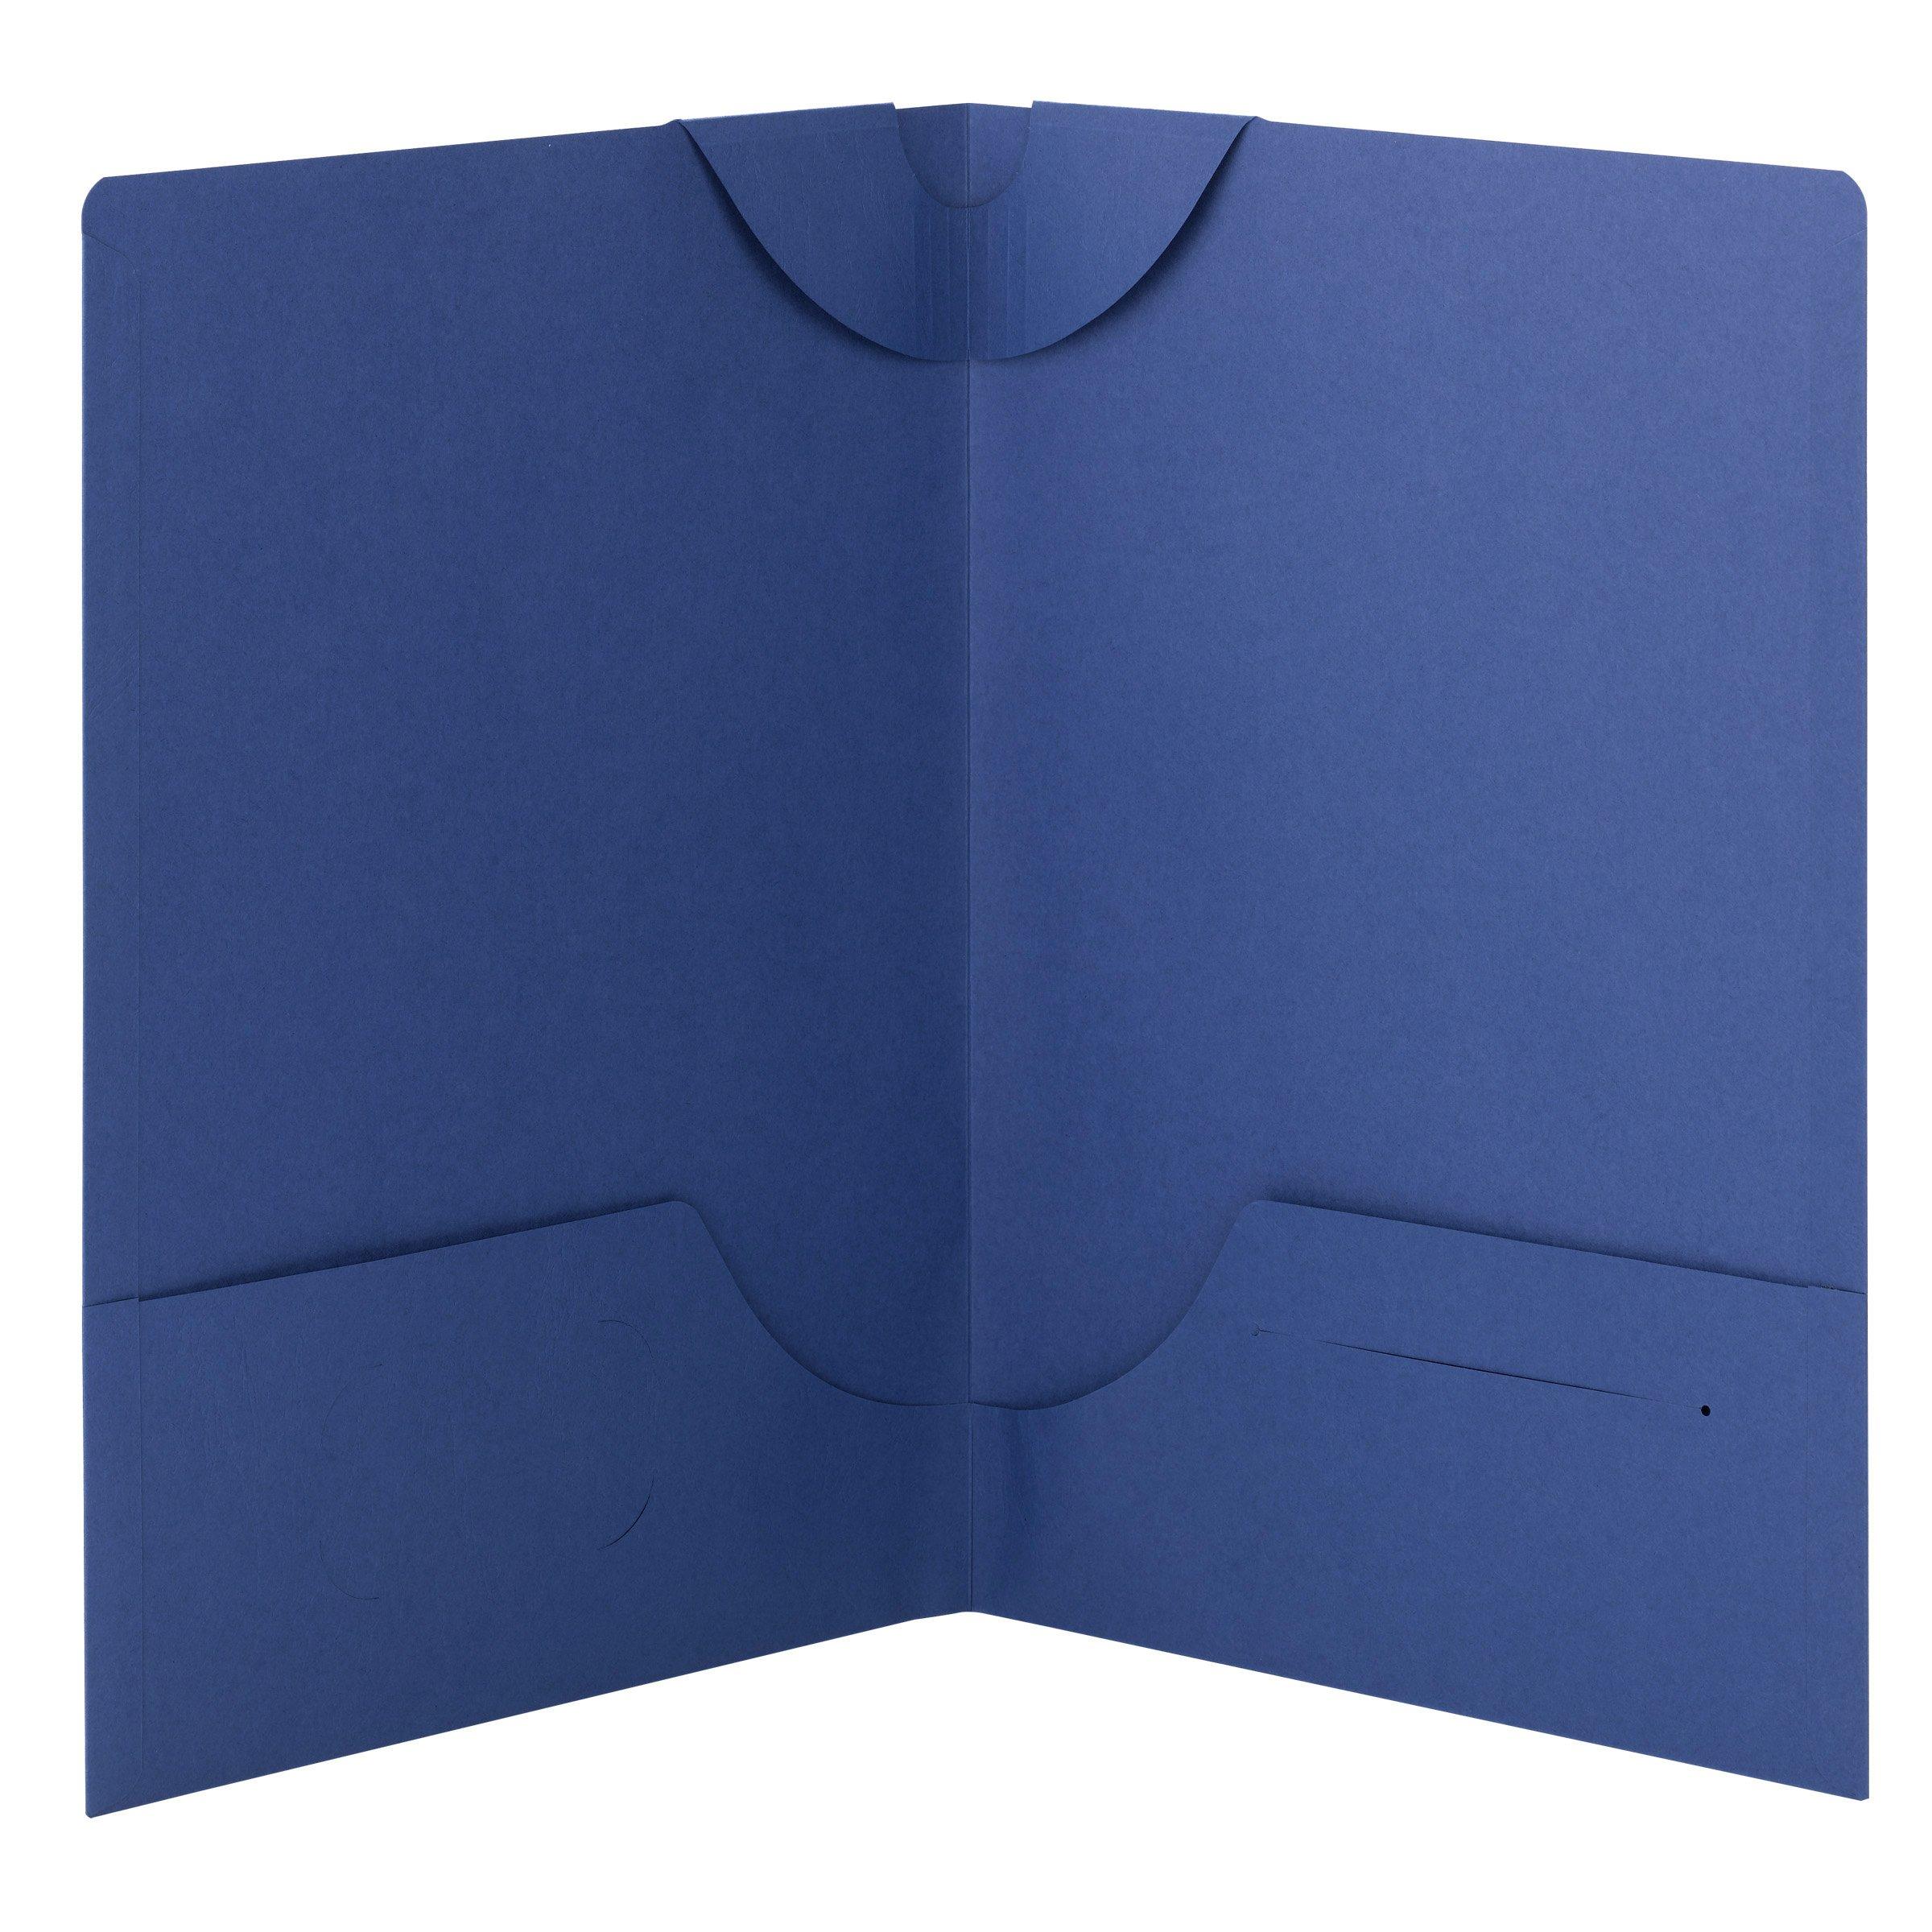 Smead Lockit Two-Pocket File Folder, Up to 50 Sheets, Legal Size, Blue, 25 per Box (87968)